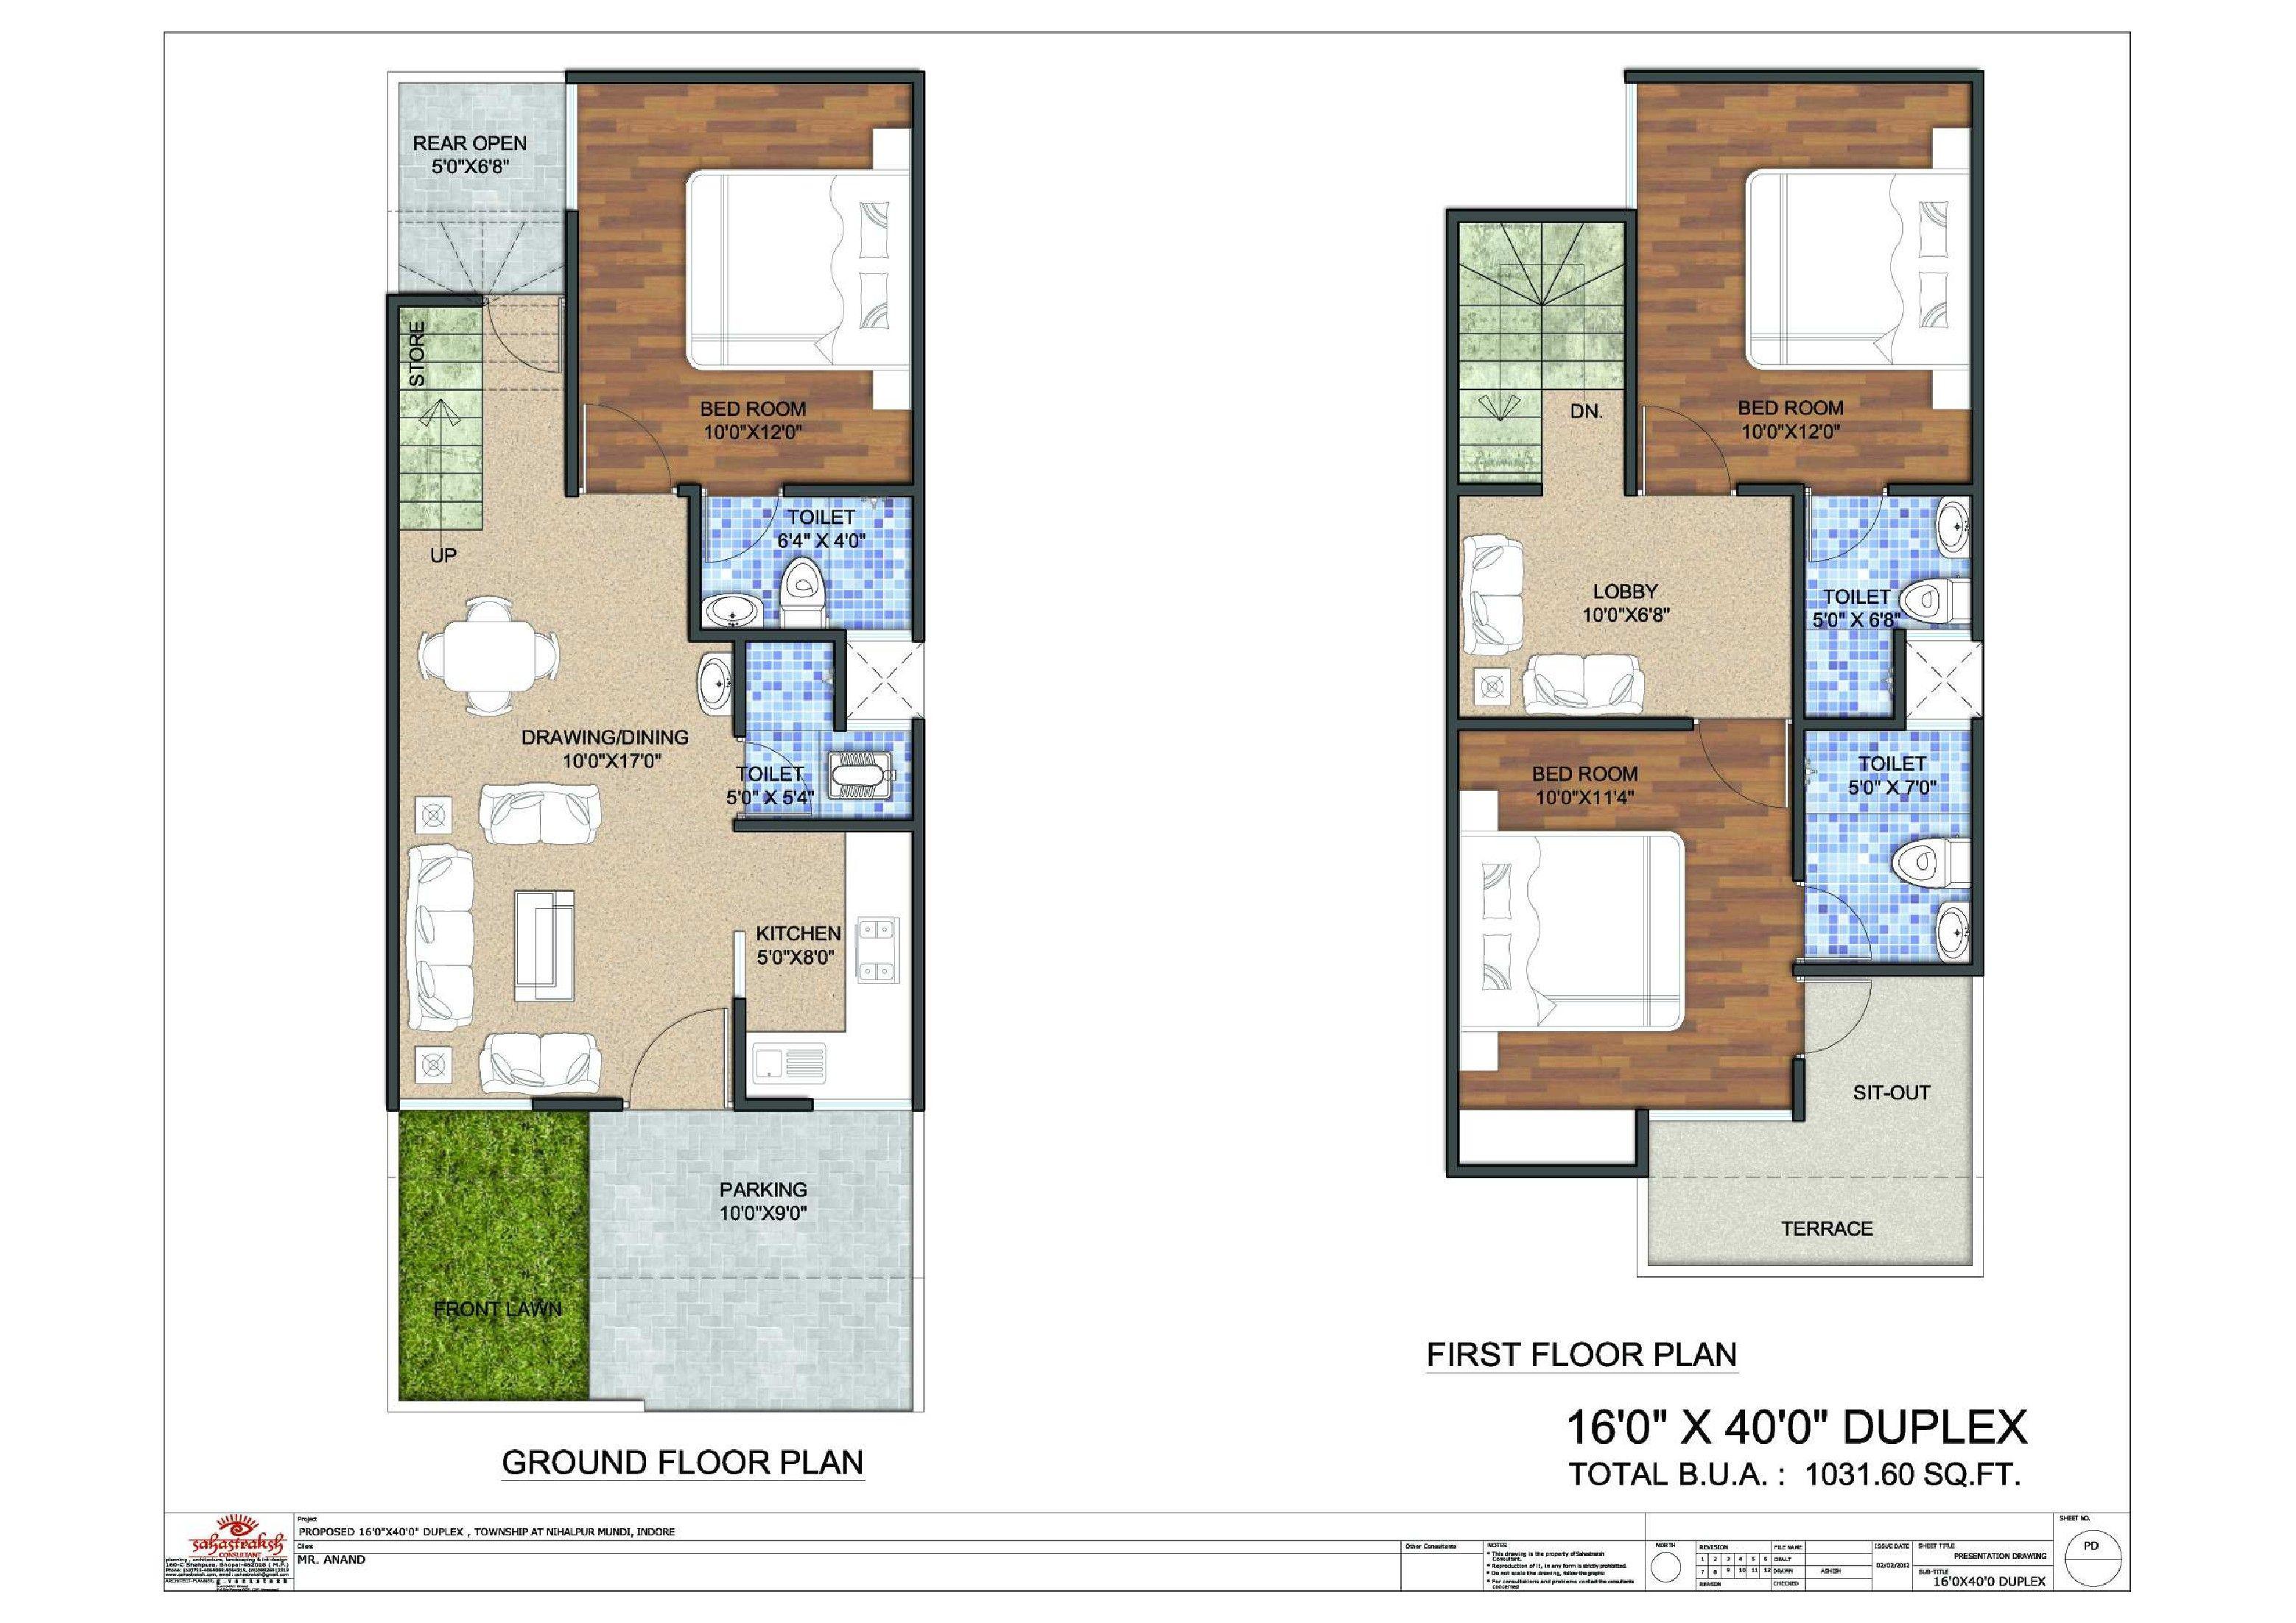 16x40 Duplex Floor Plan Flat For